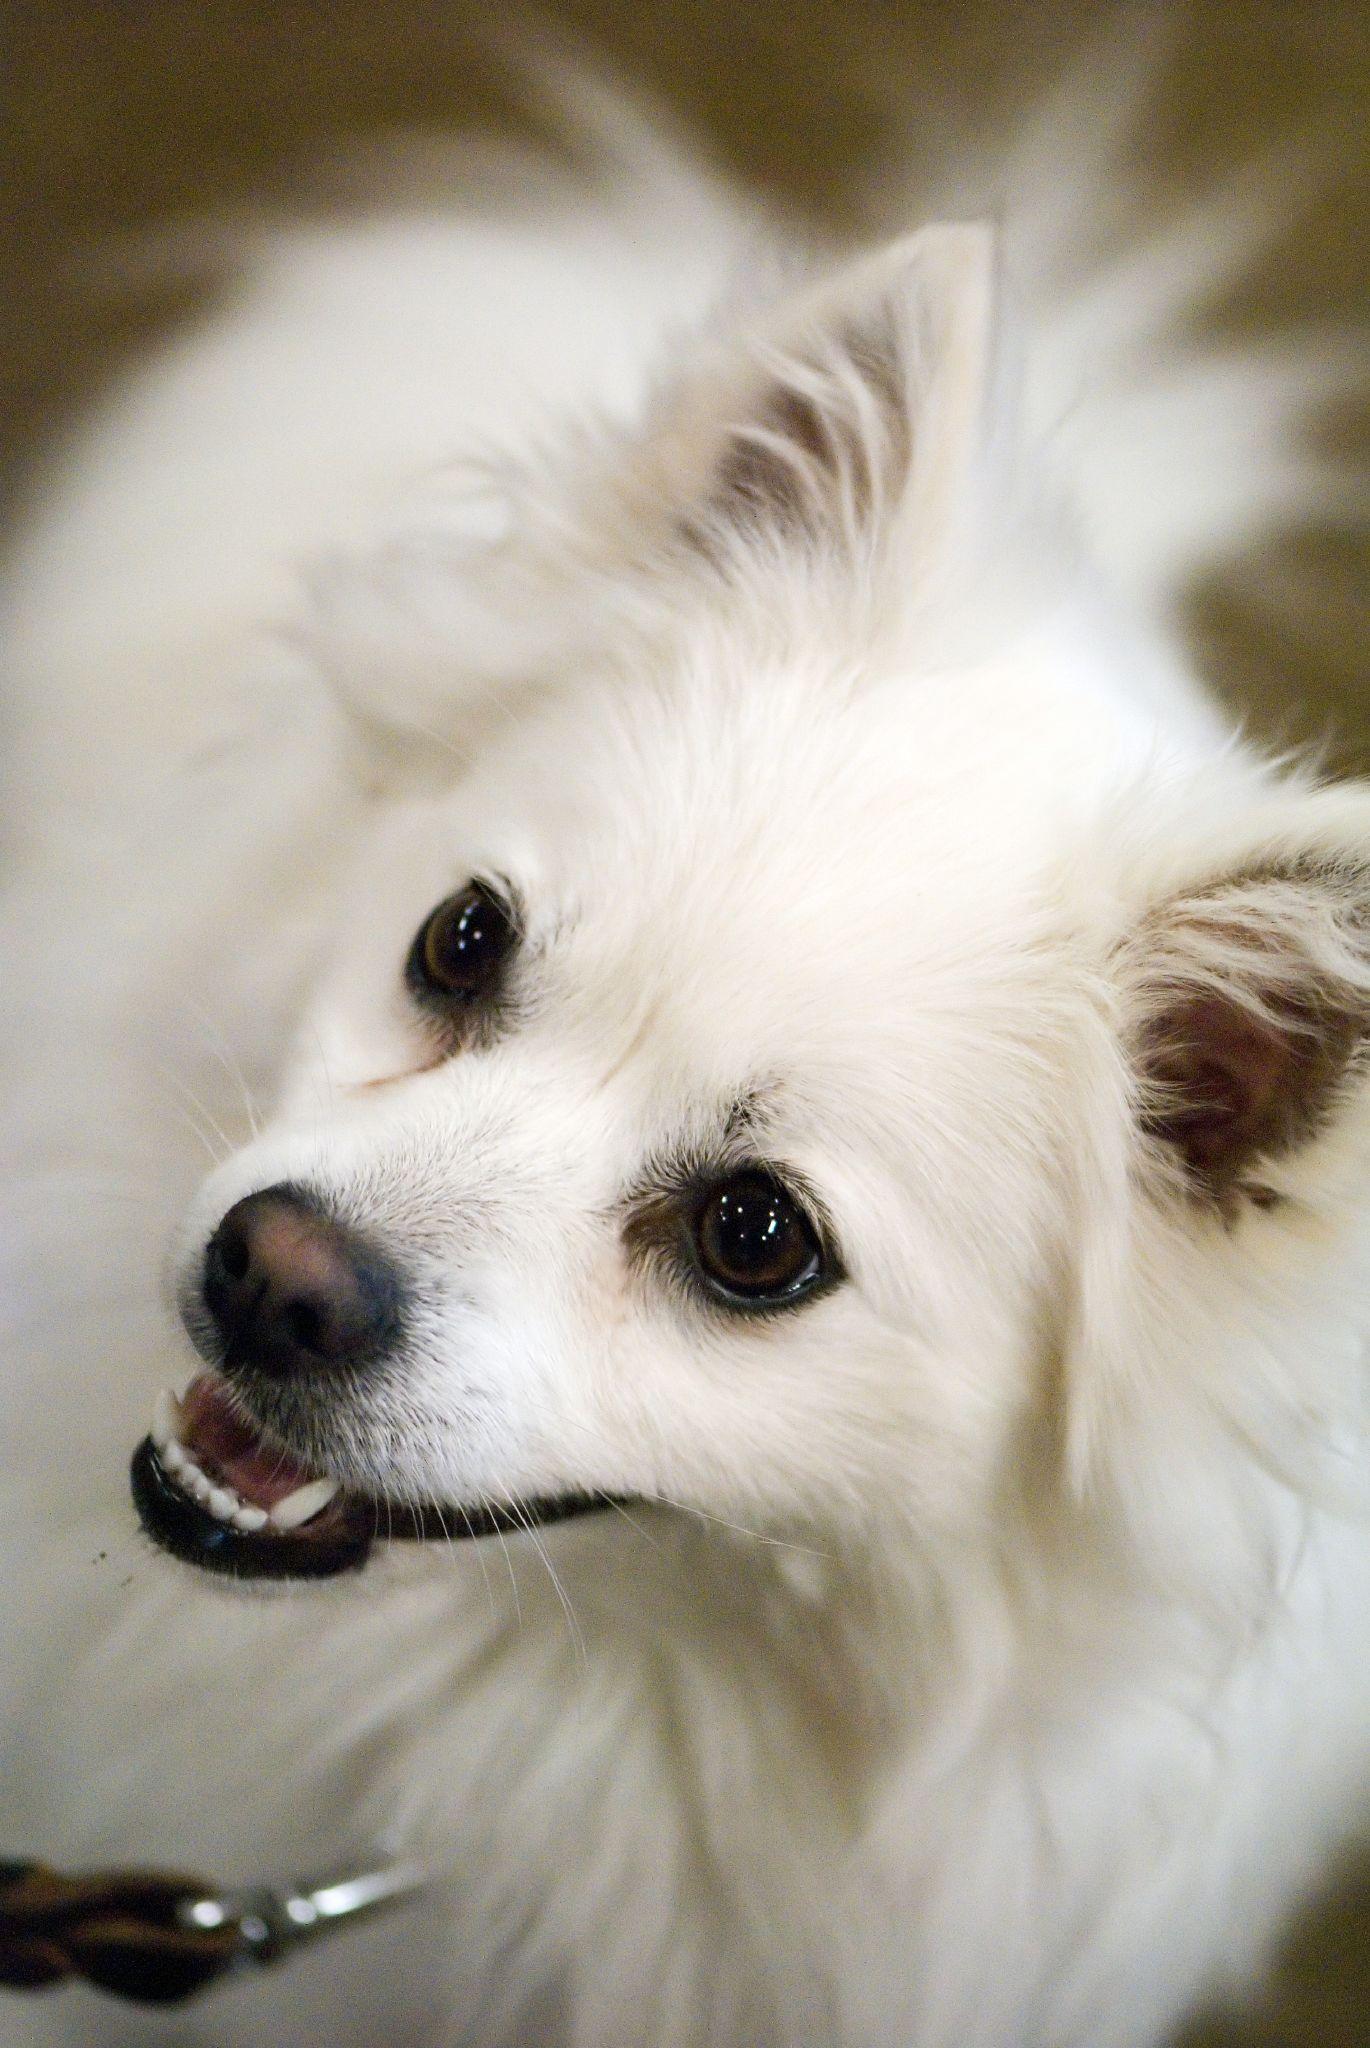 http://upload.wikimedia.org/wikipedia/commons/e/e3/American_Eskimo_Dog_portrait_above.jpg